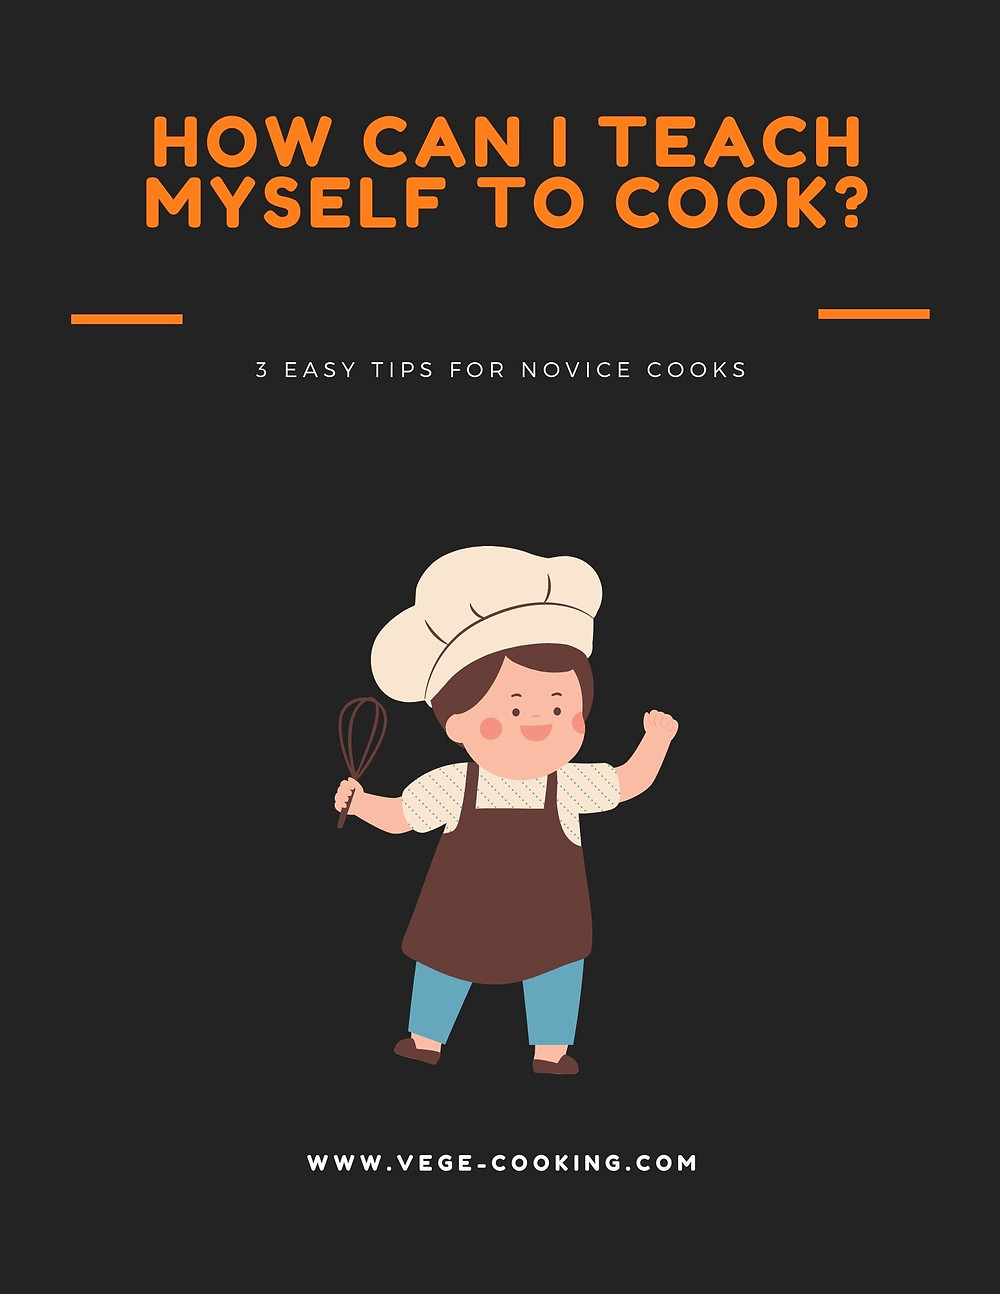 How can I teach myself to cook?